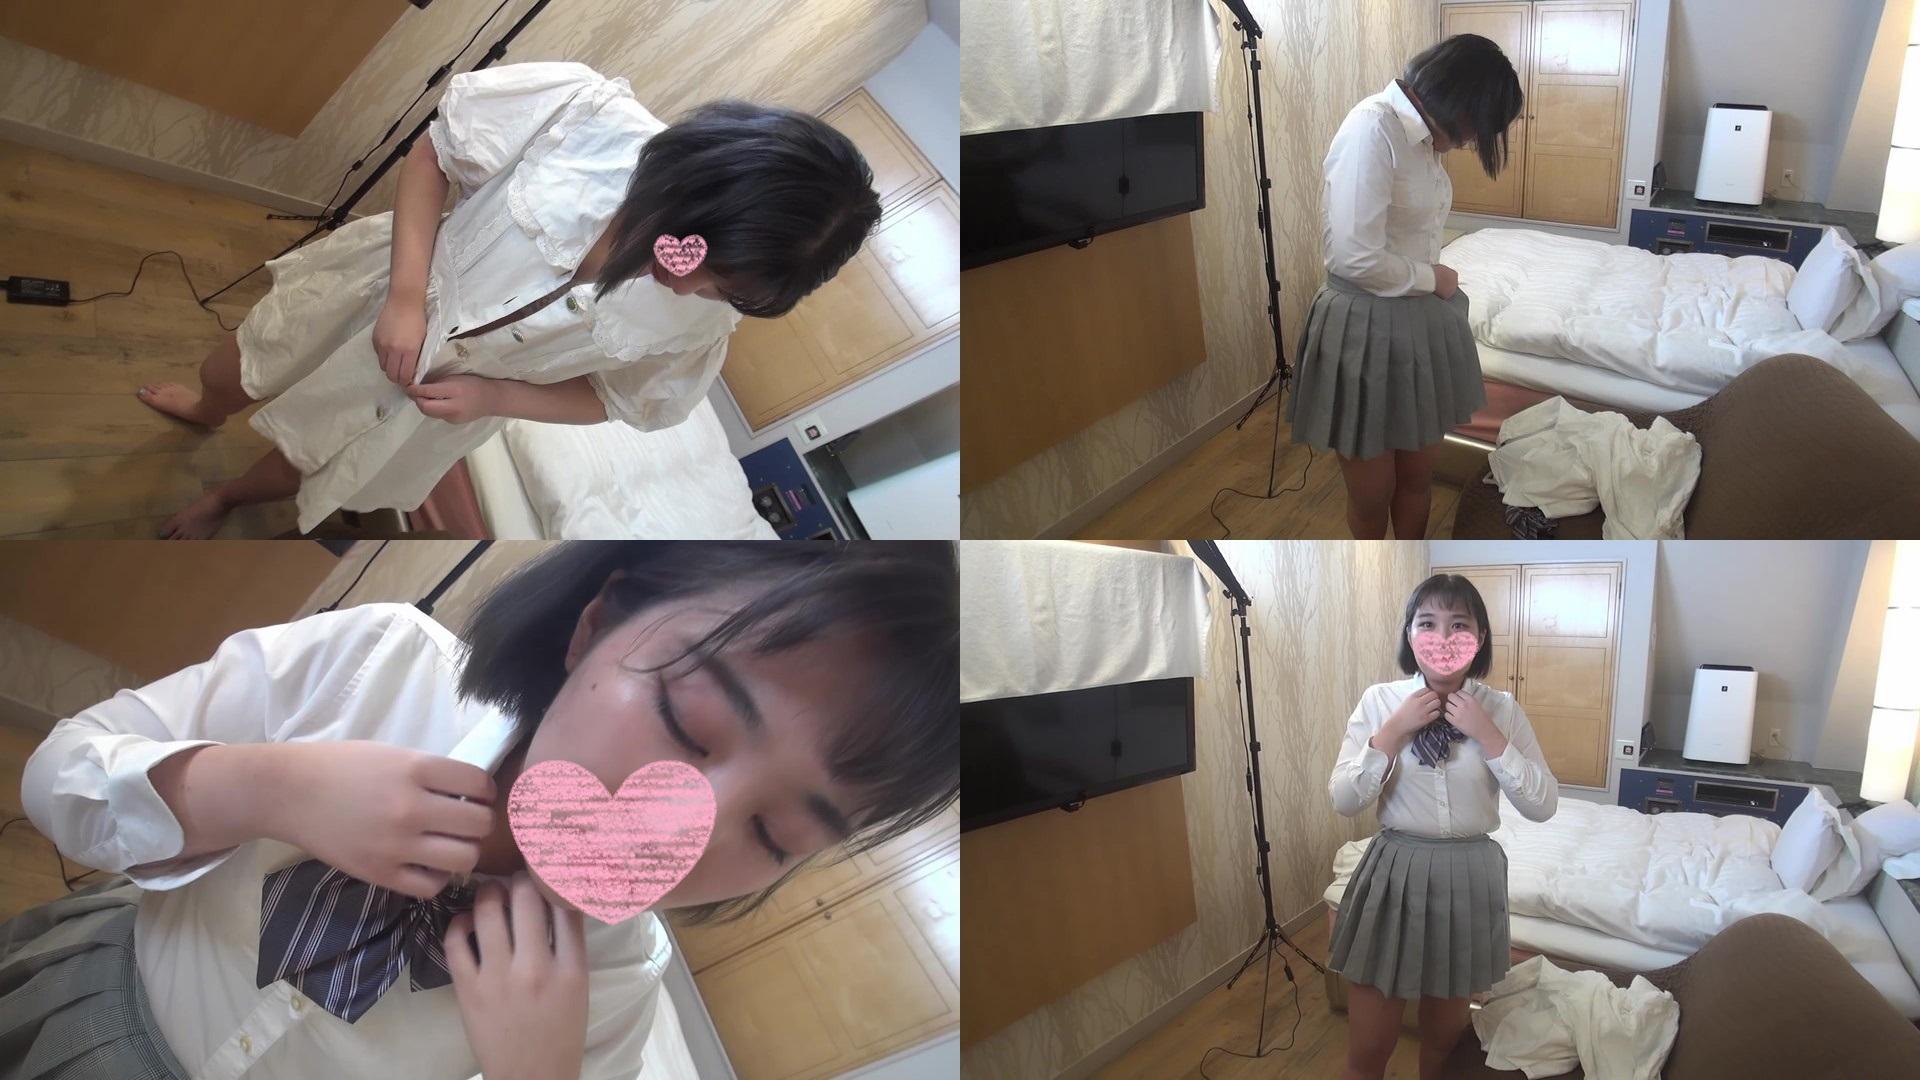 FC2-PPV 1463564 Lifes First 3P Ubu Daughter Unprocessed Pubic Hair Kitsuman Hyundaikko Got A 3P Remnant Remedy